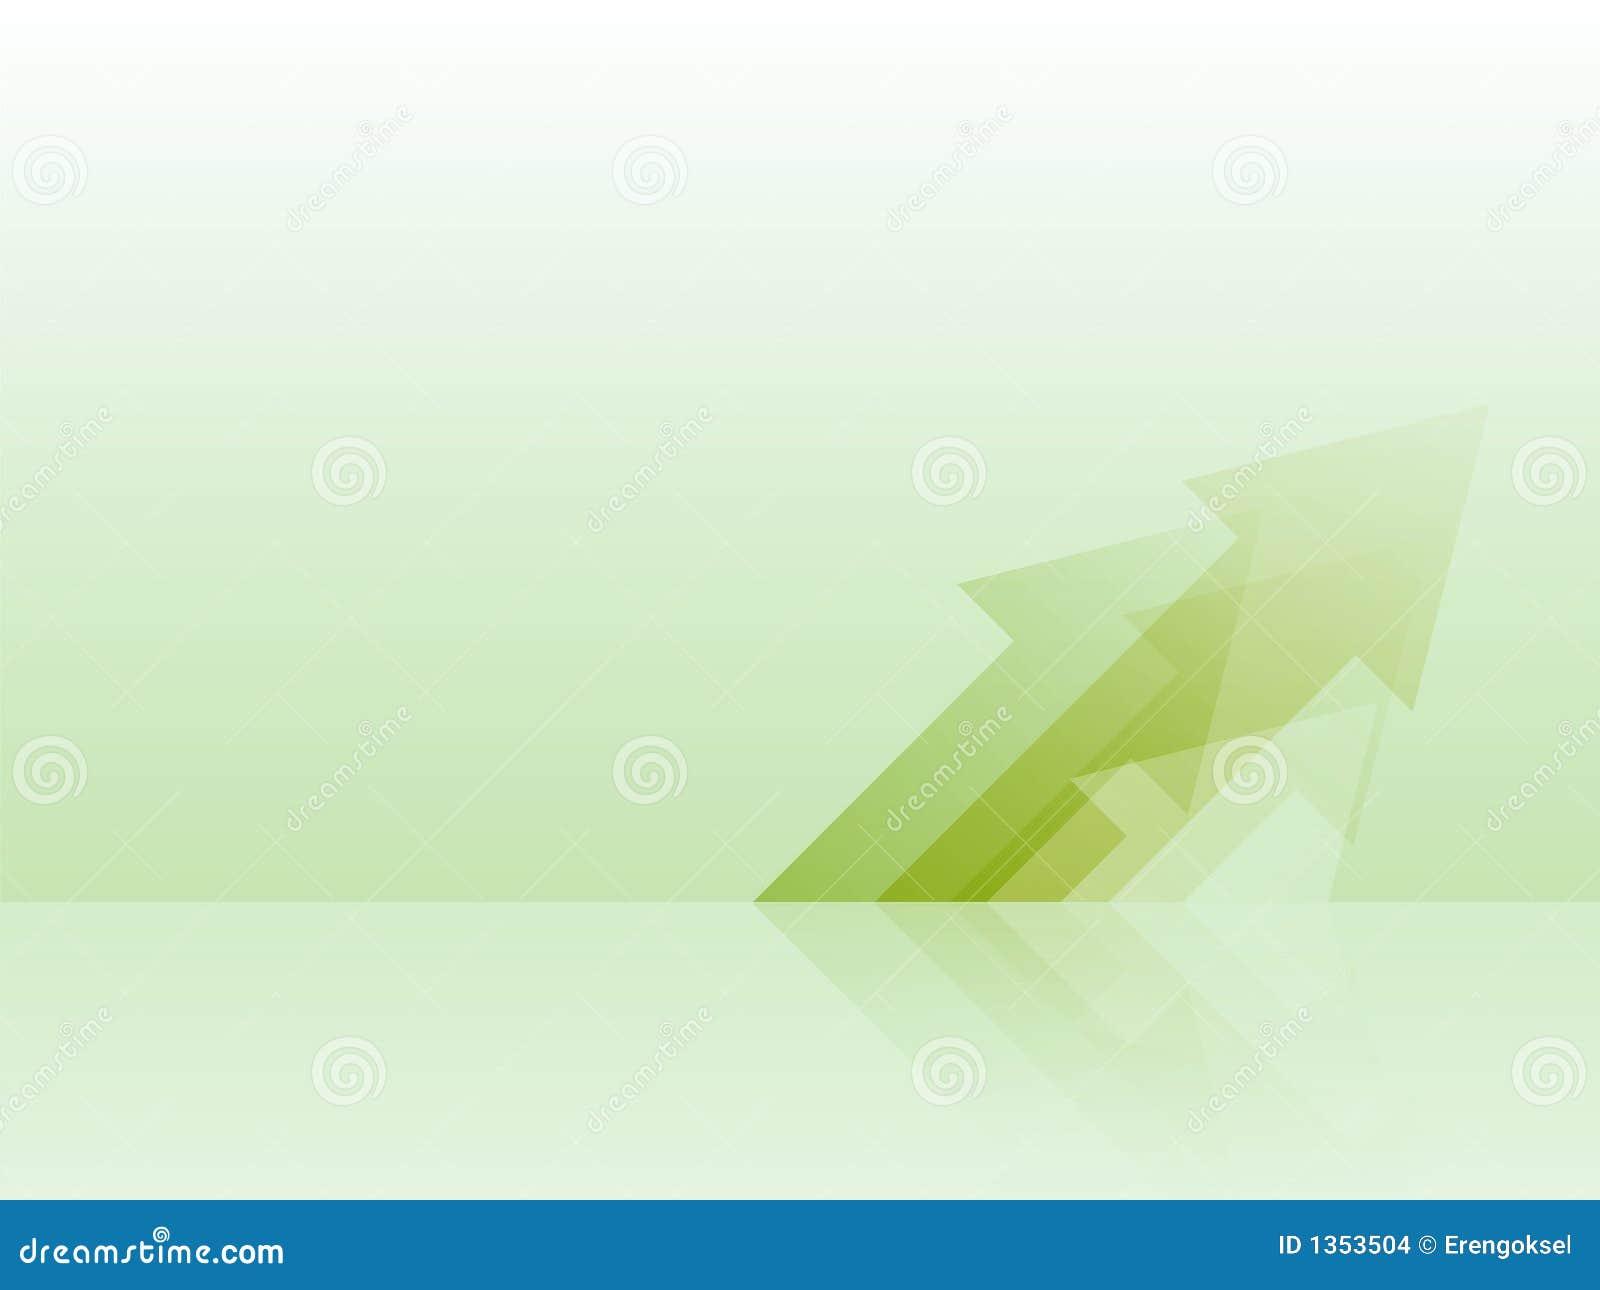 presentation background stock images